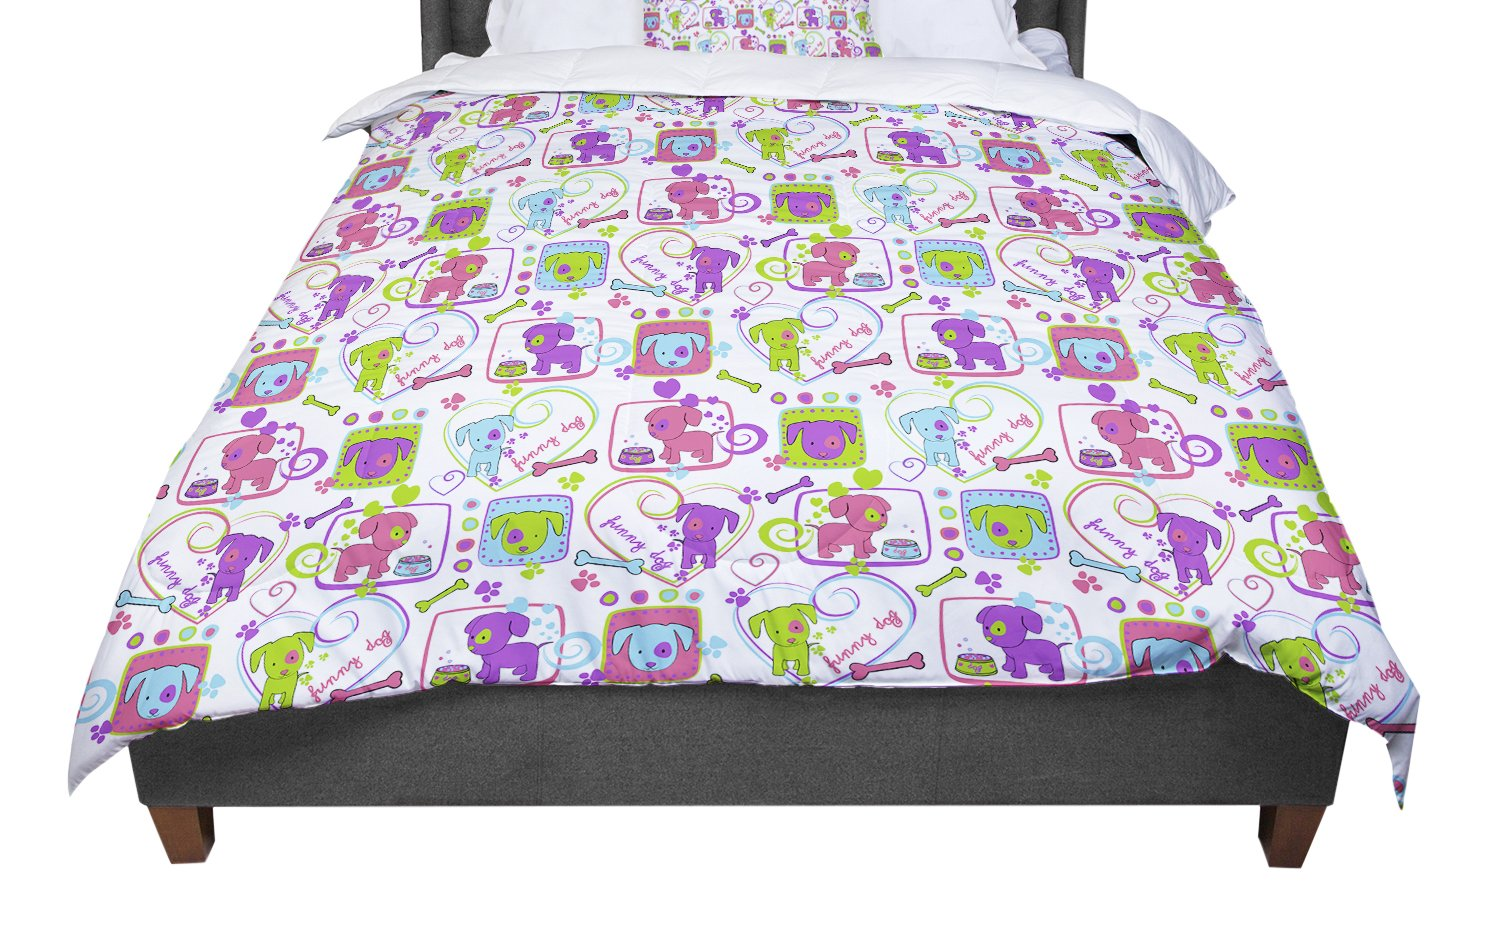 KESS InHouse Julia Grifol My Loving Dogs Queen Comforter 88 X 88